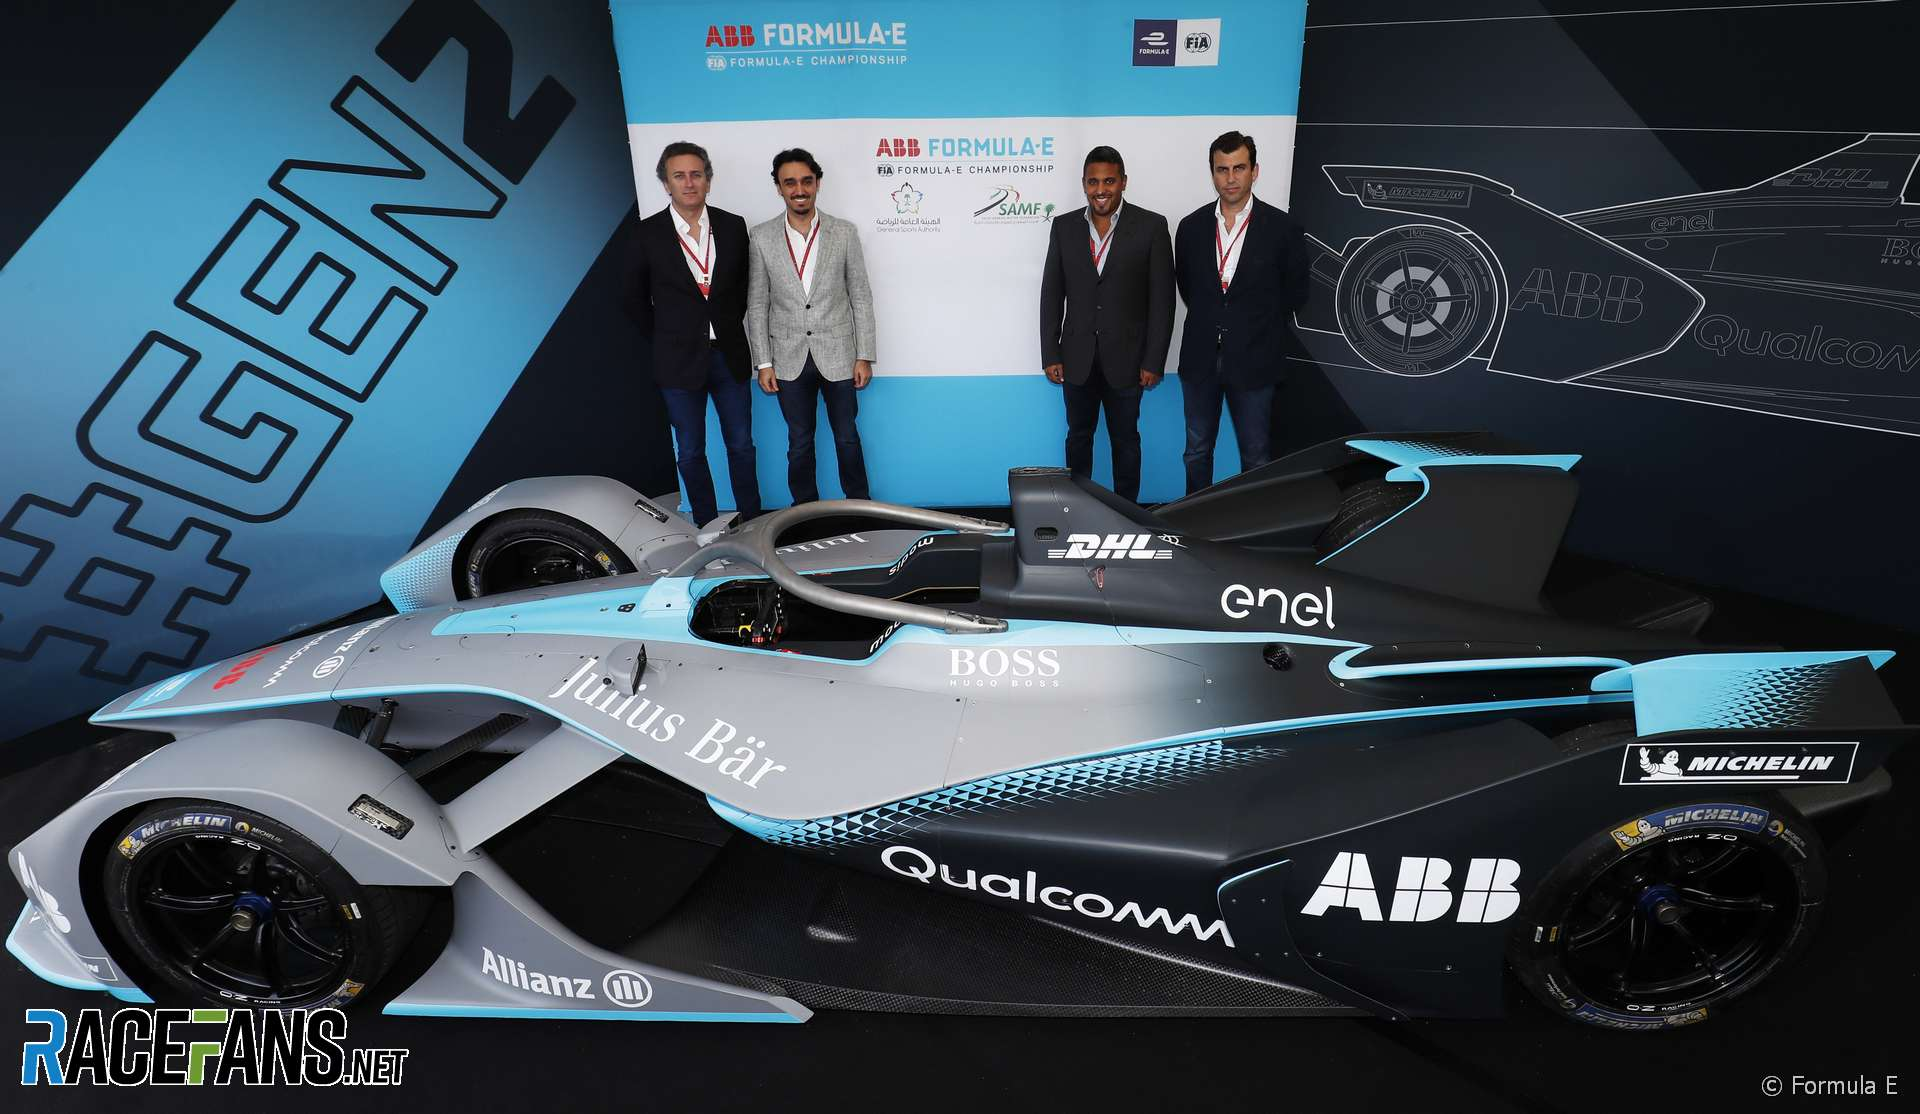 Alejandro Agag, Prince Abdulaziz bin Turki AlFaisal Al Saud, Prince Khaled Bin Sultan Bin Abdullah AlFaisal, Alberto Longo, Formula E, 2018